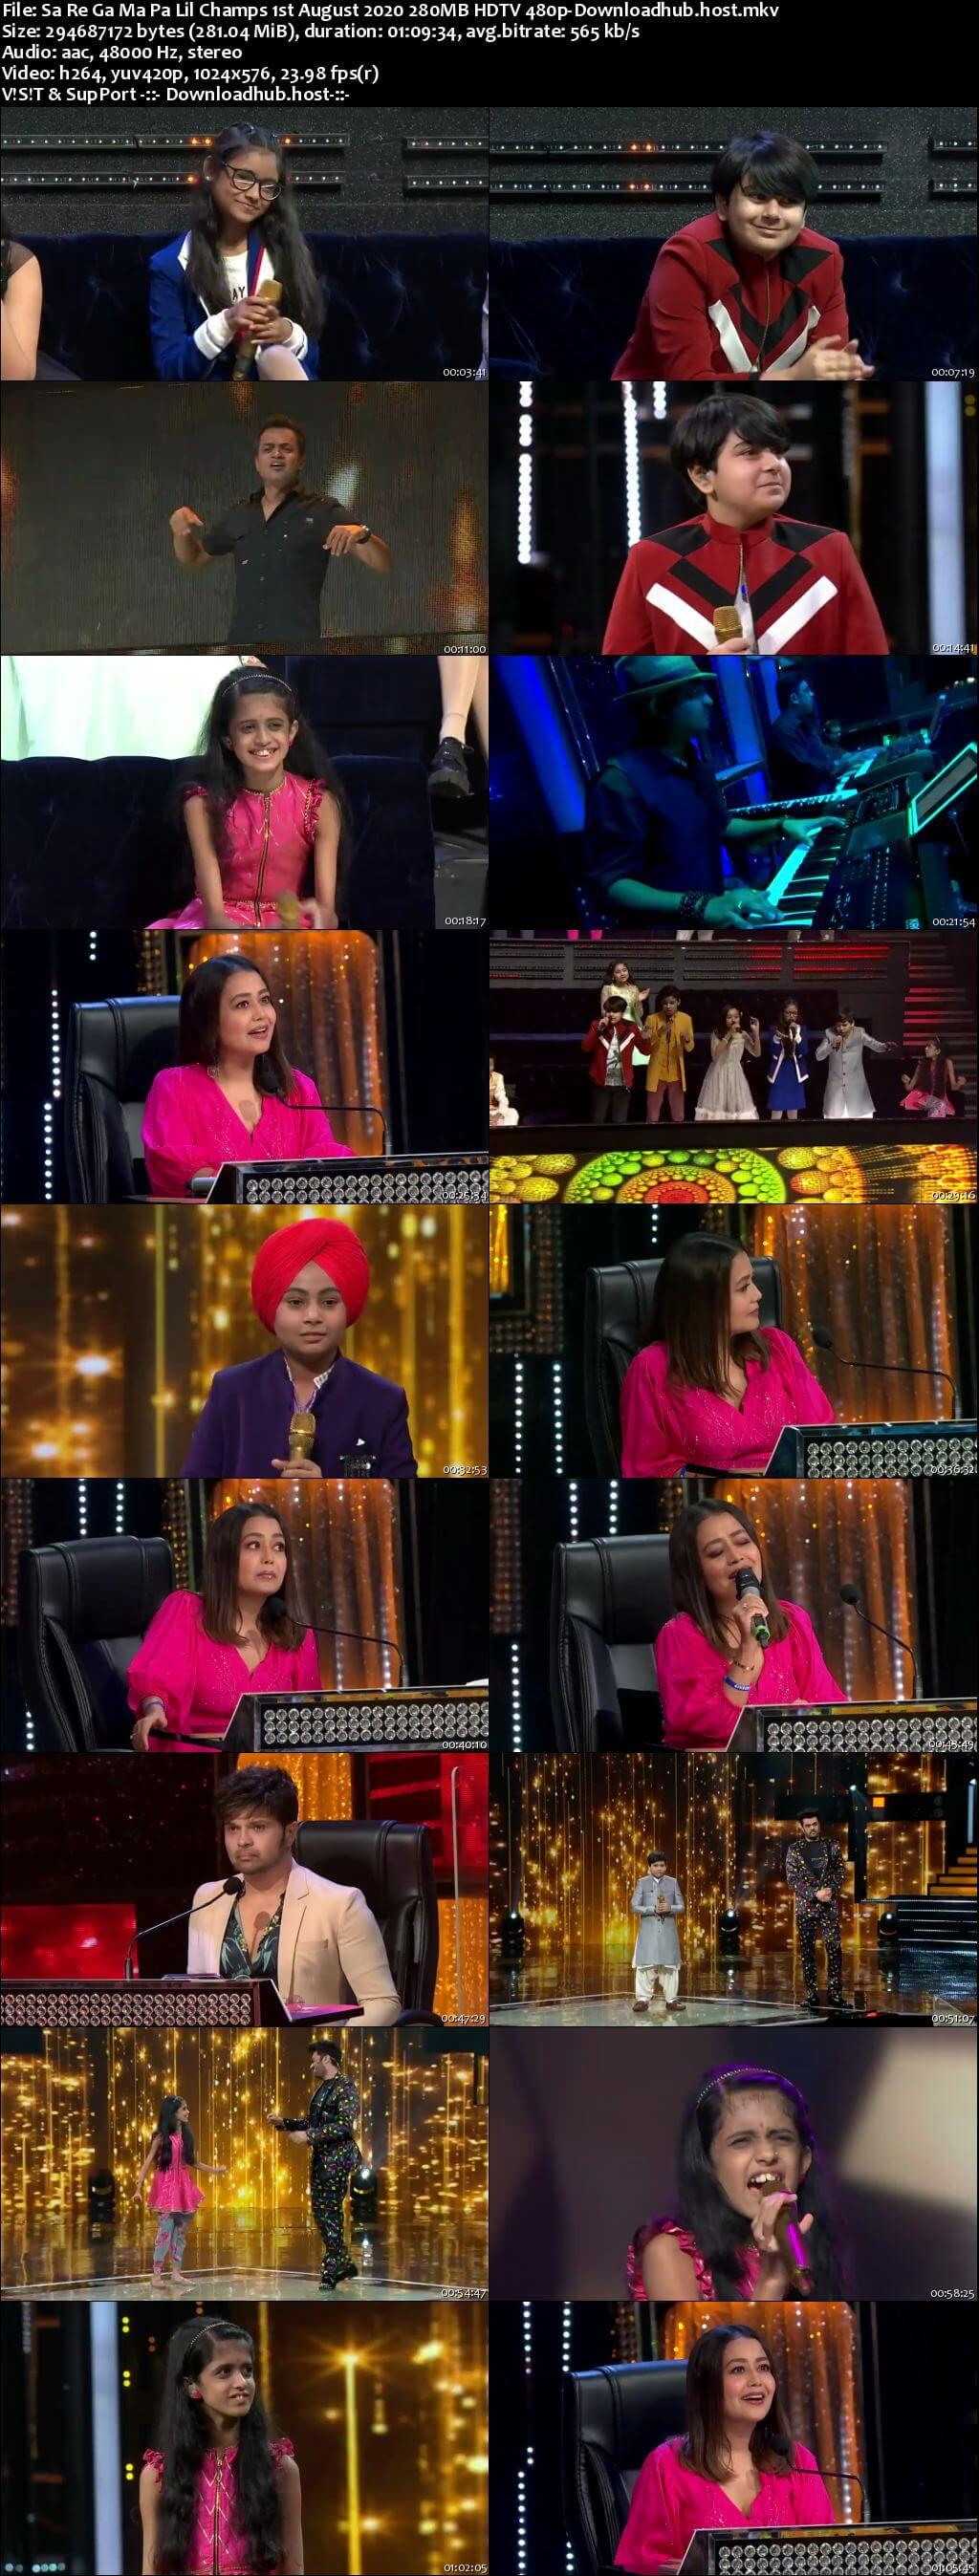 Sa Re Ga Ma Pa Lil Champs 01 August 2020 Episode 13 HDTV 480p